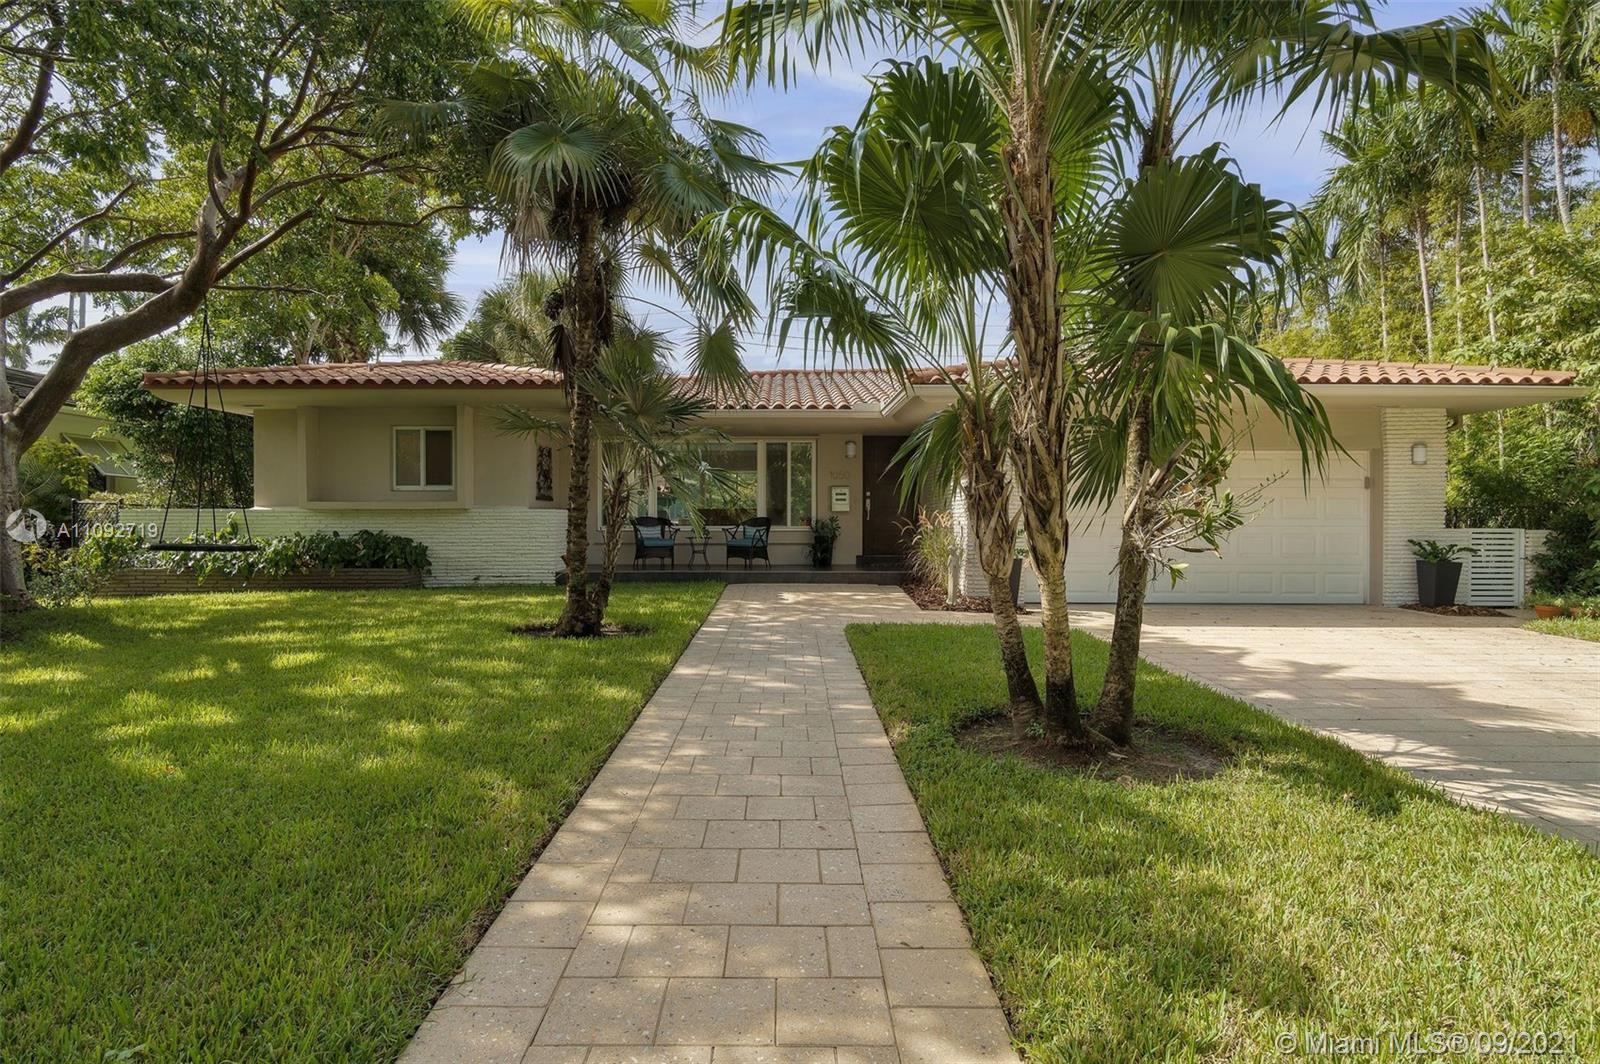 1050 96th St, Miami Shores, Florida 33138